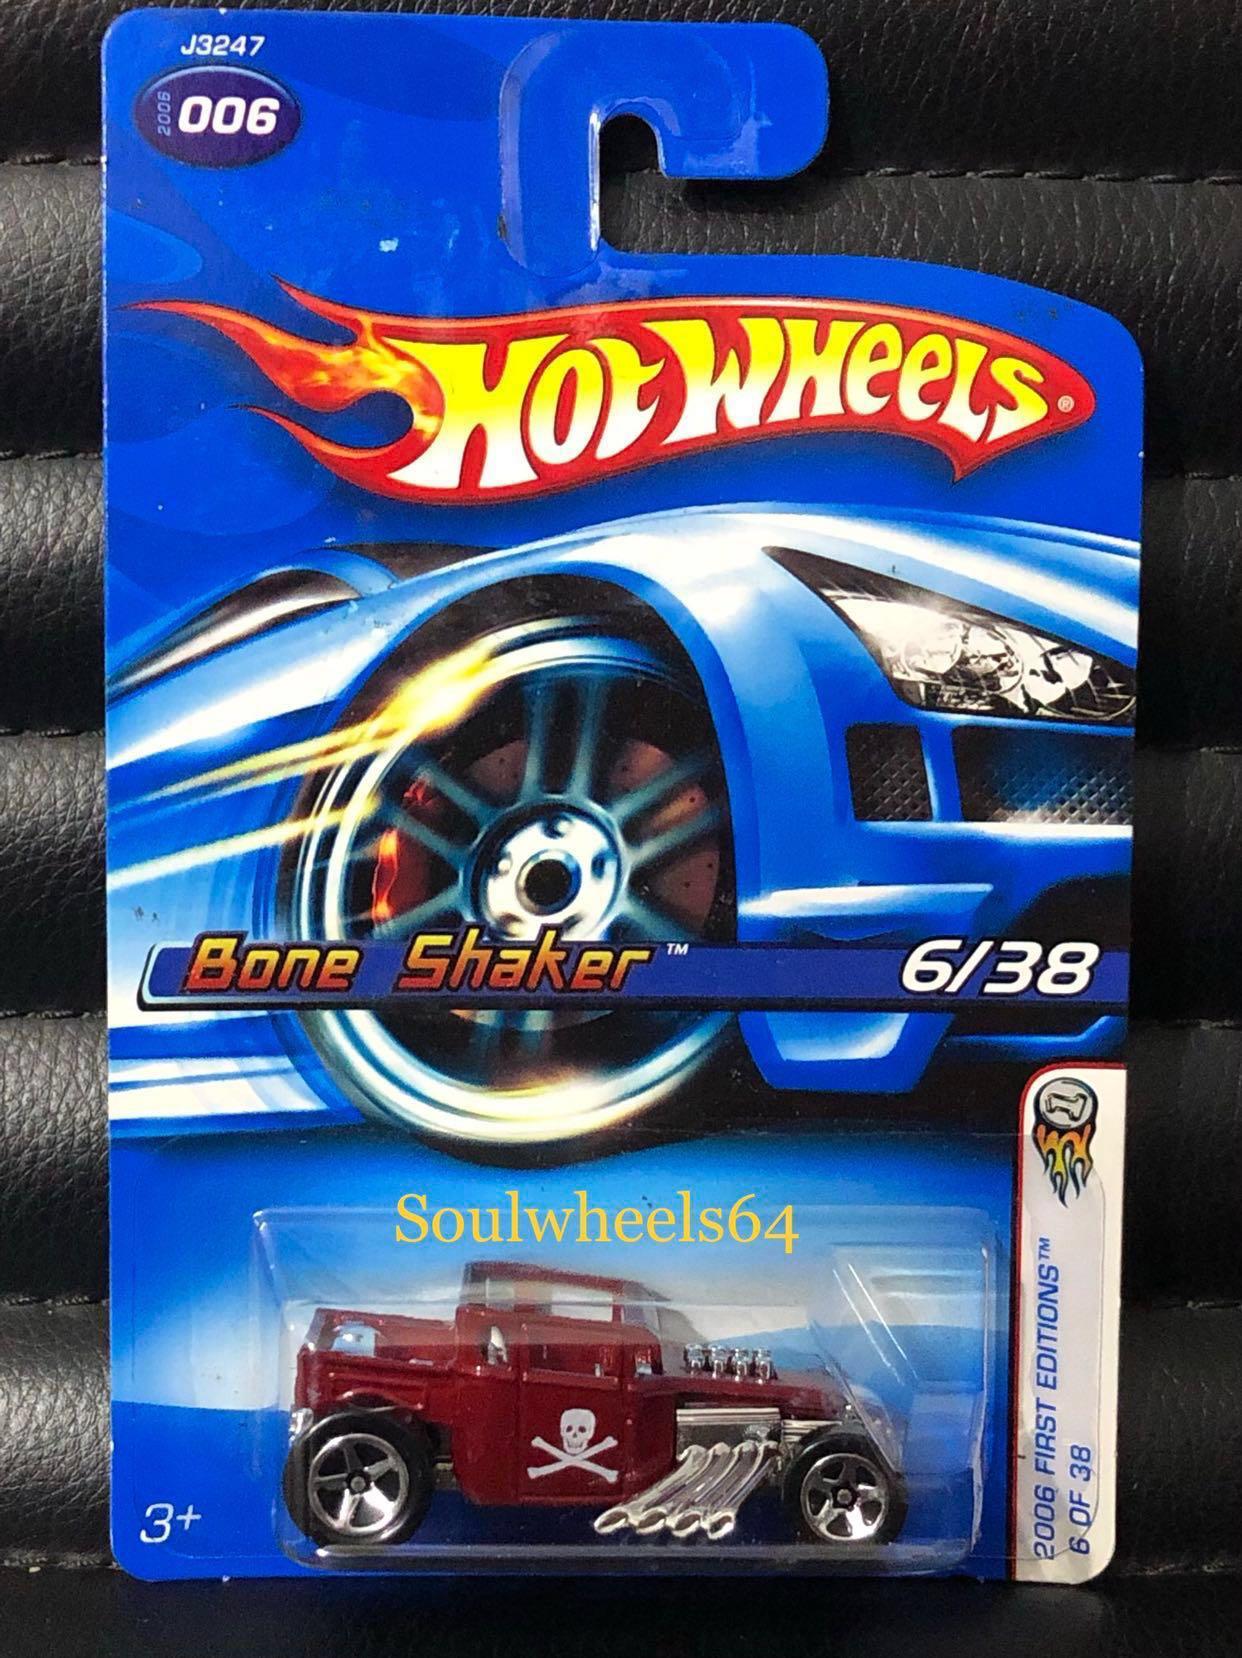 e4c61f11ac Hot Wheels Bone Shaker Boneshaker 1st Edition (Red  Silver Chrome ...